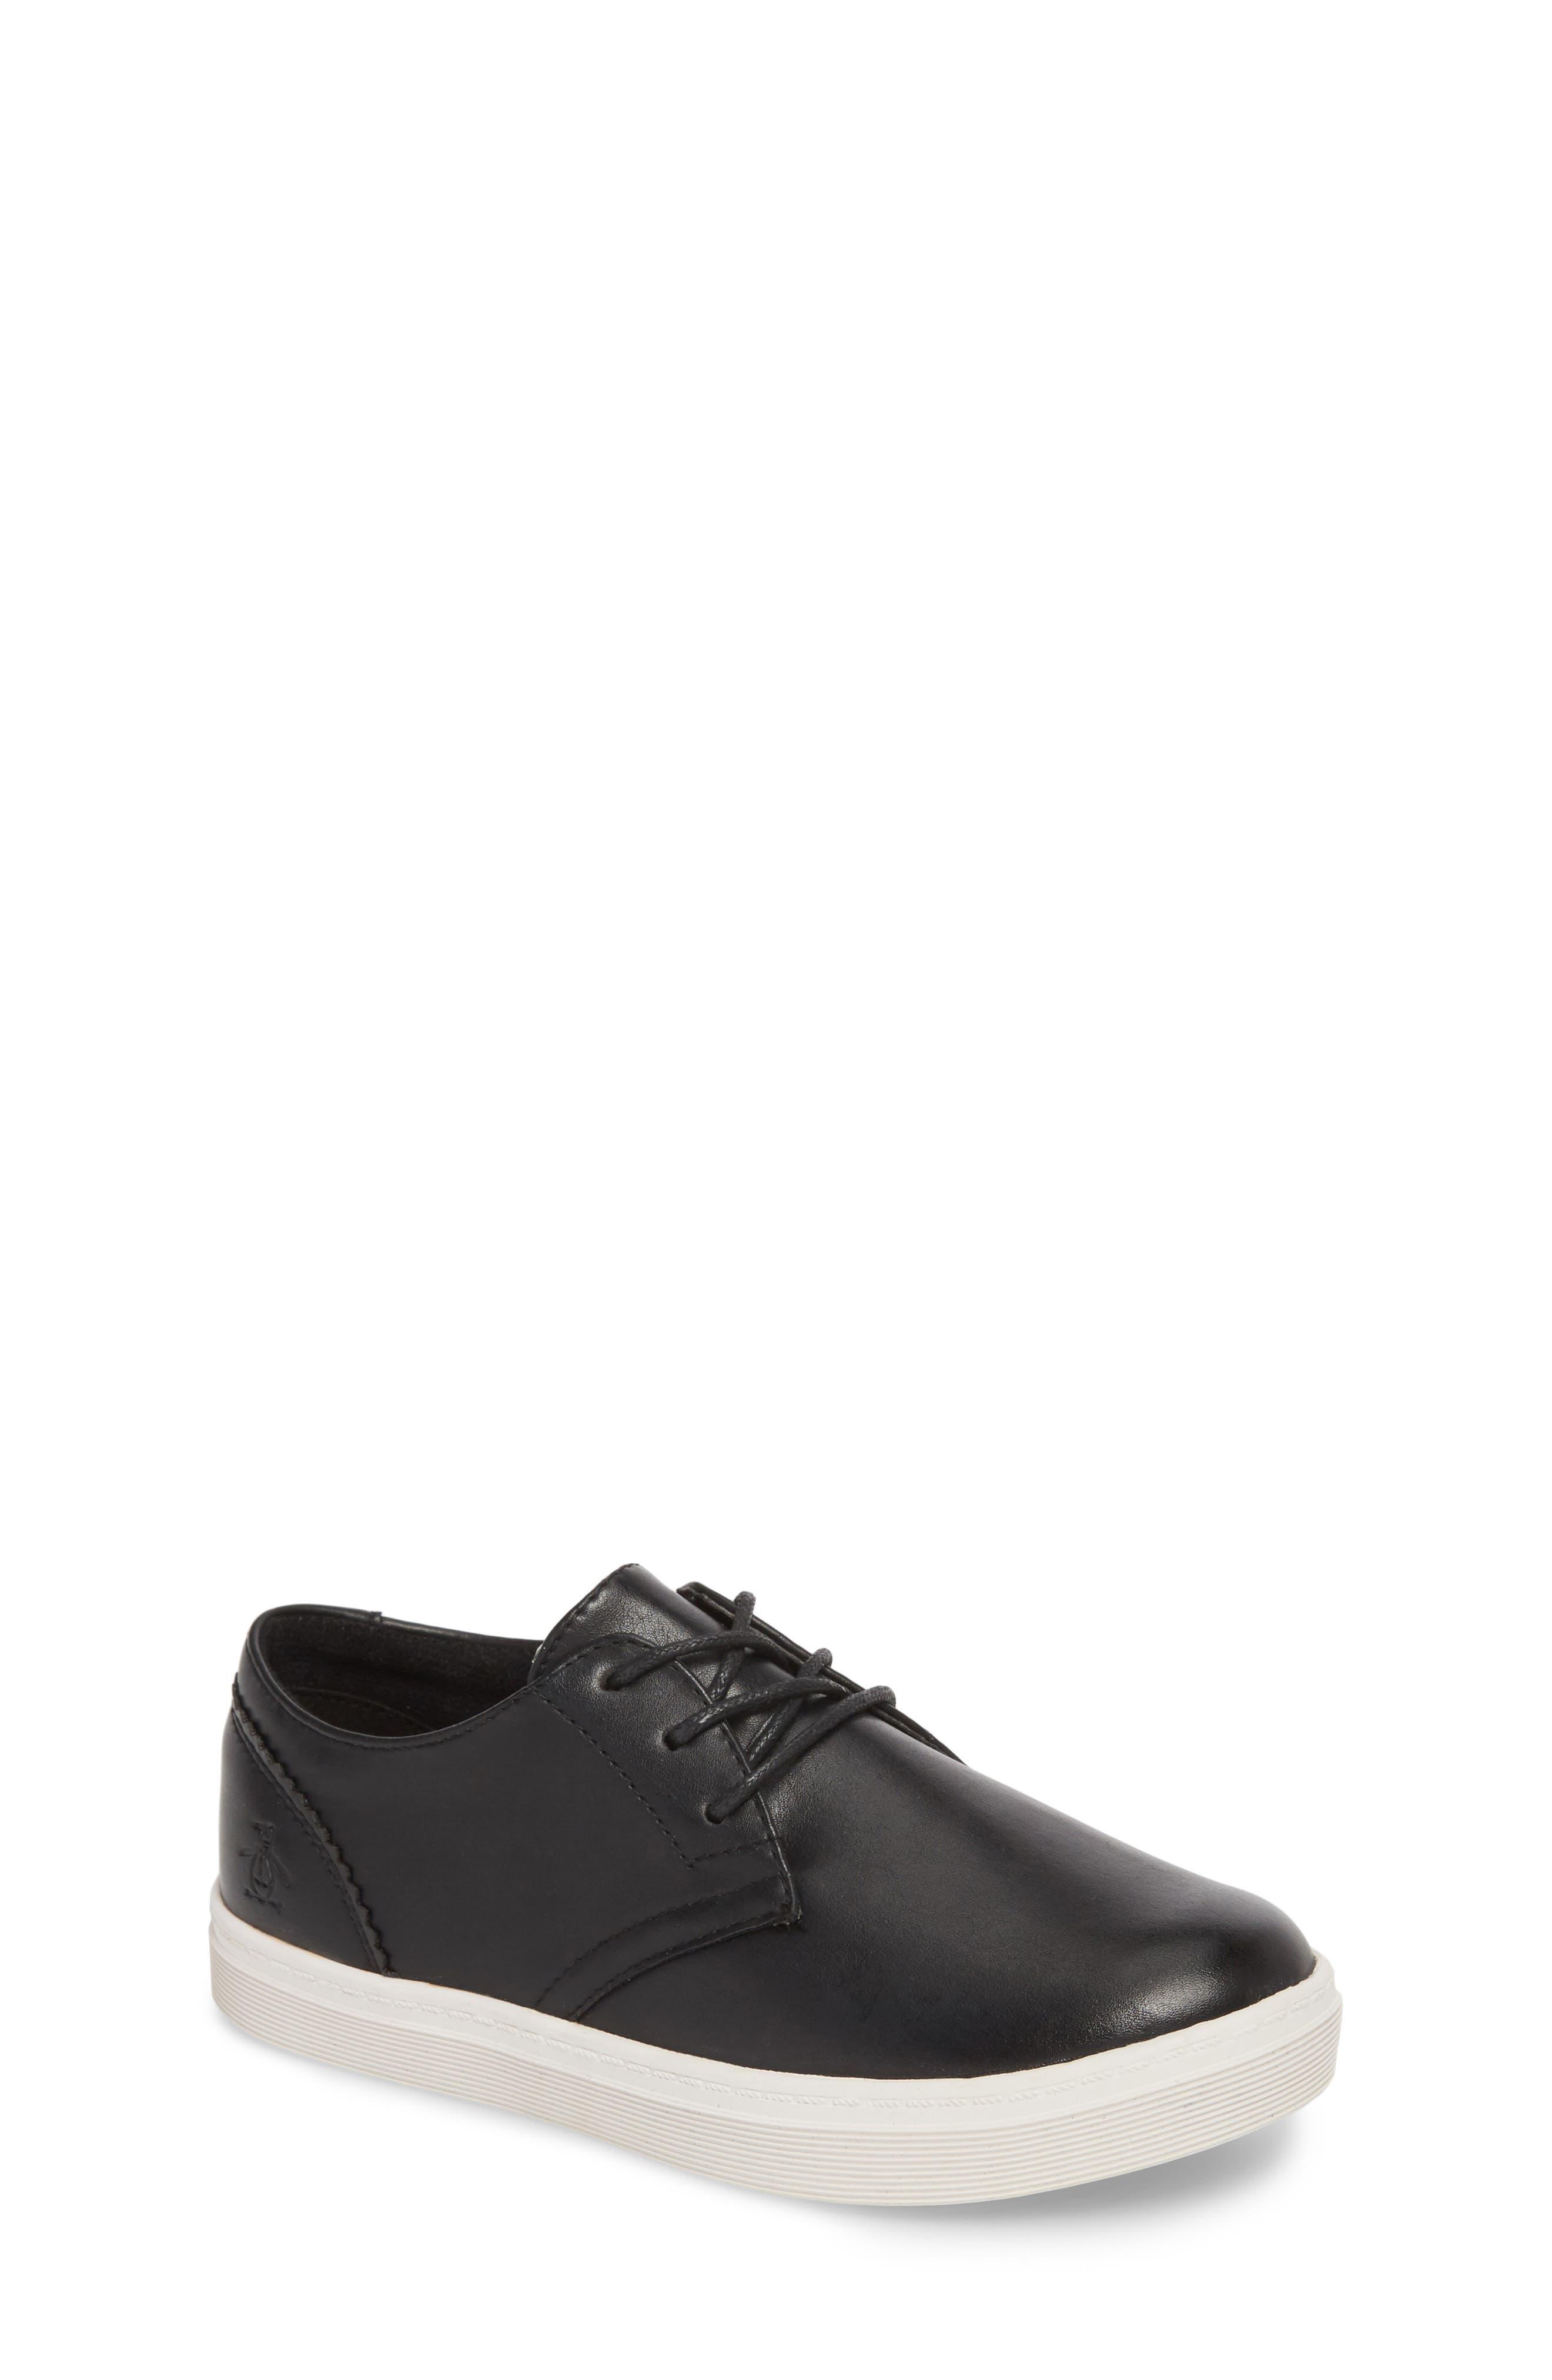 Freeland Sneaker,                             Main thumbnail 1, color,                             Black